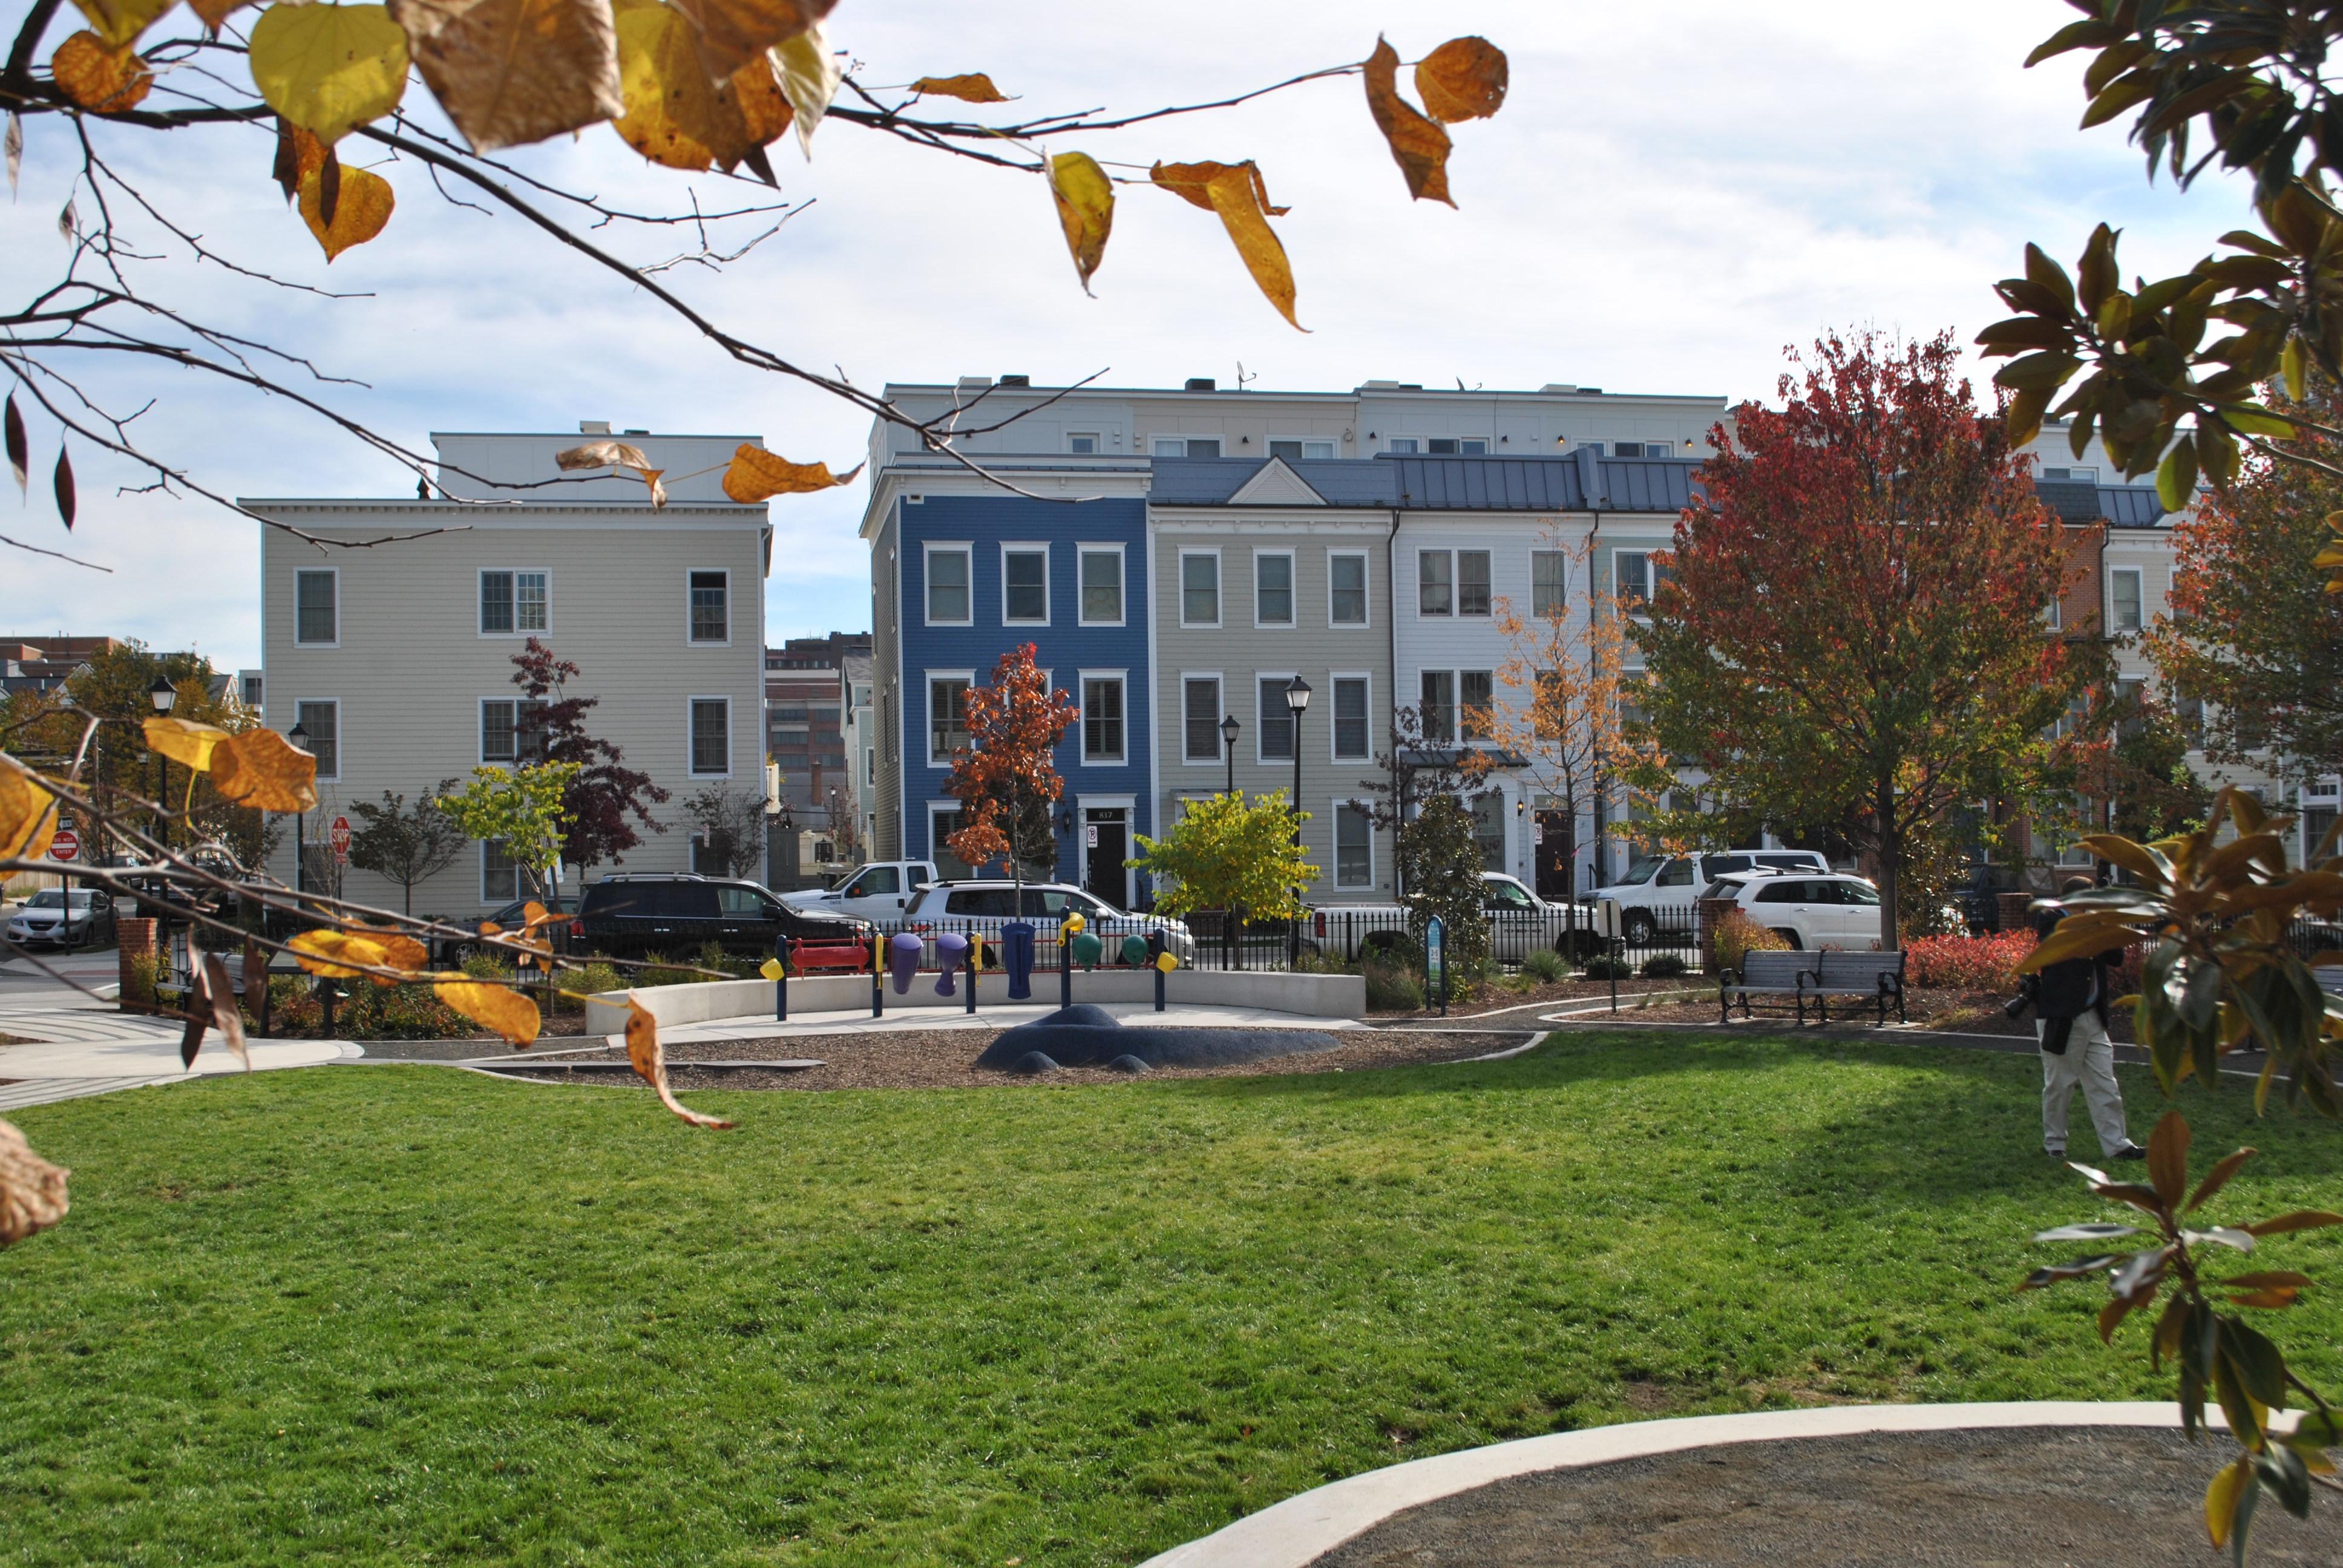 city, developer celebrate completion of james bland redevelopment